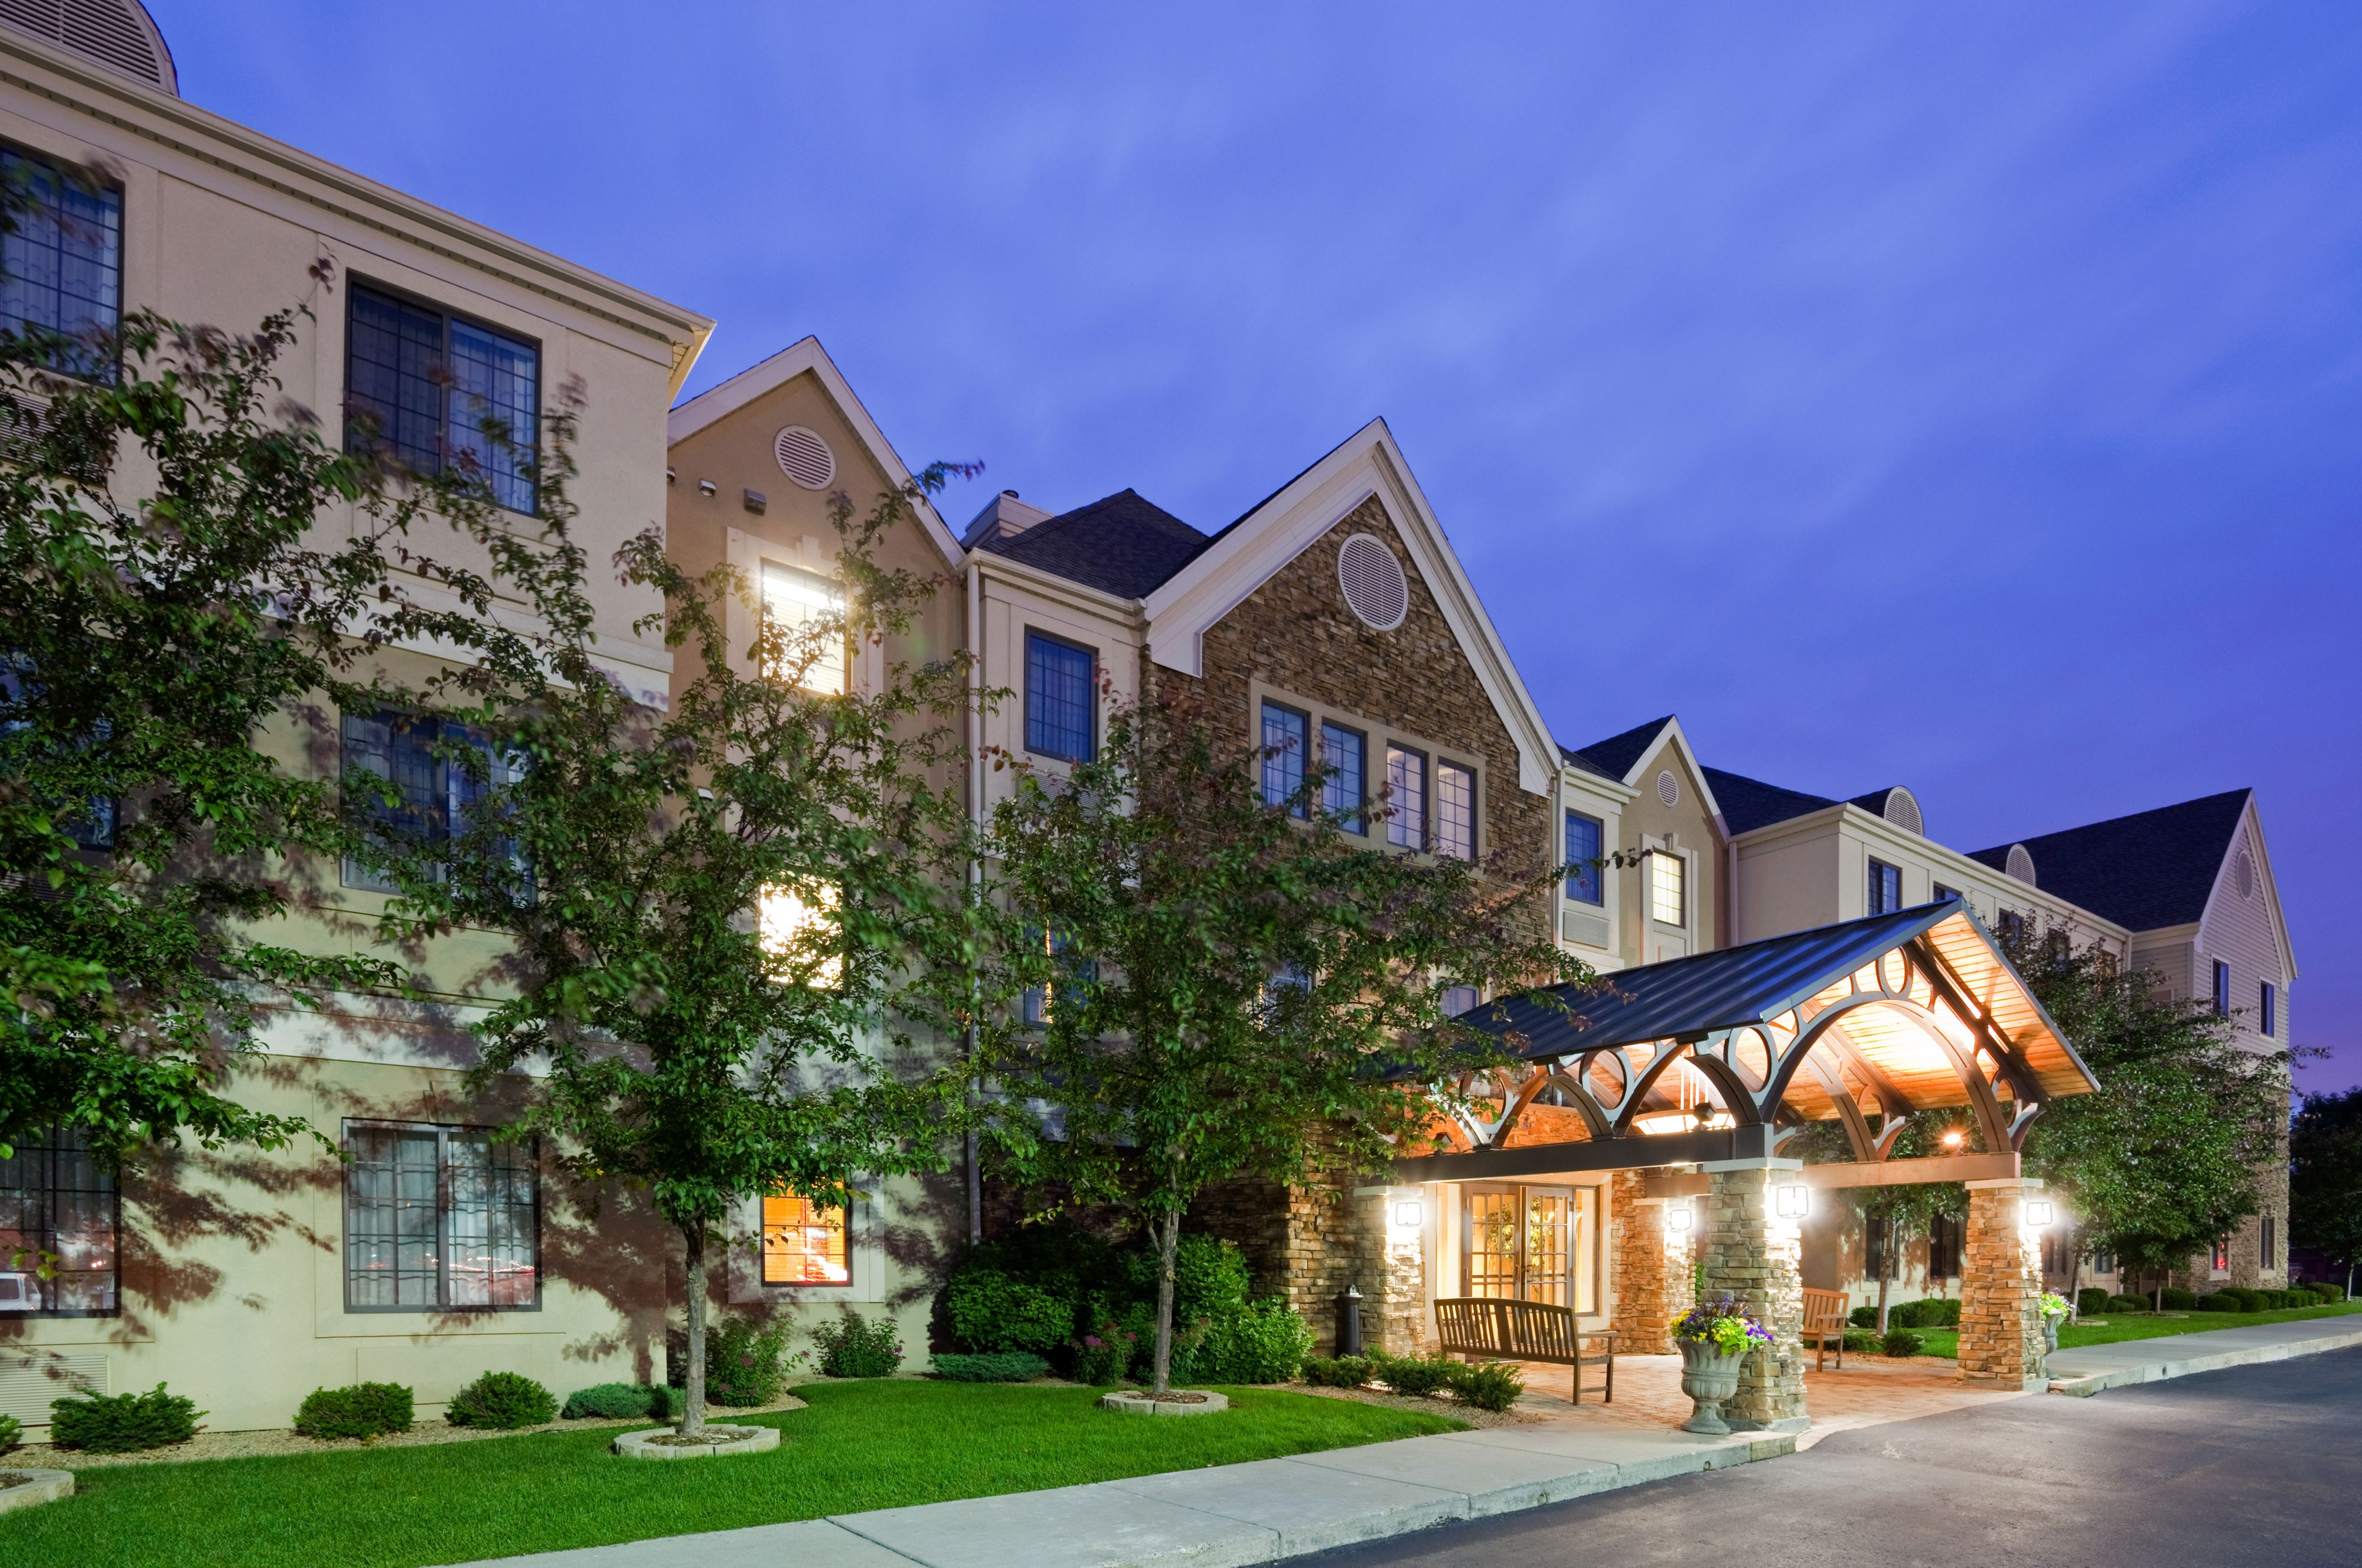 Staybridge Suites Eagan Arpt South Mall Area Eagan Minnesota Mn